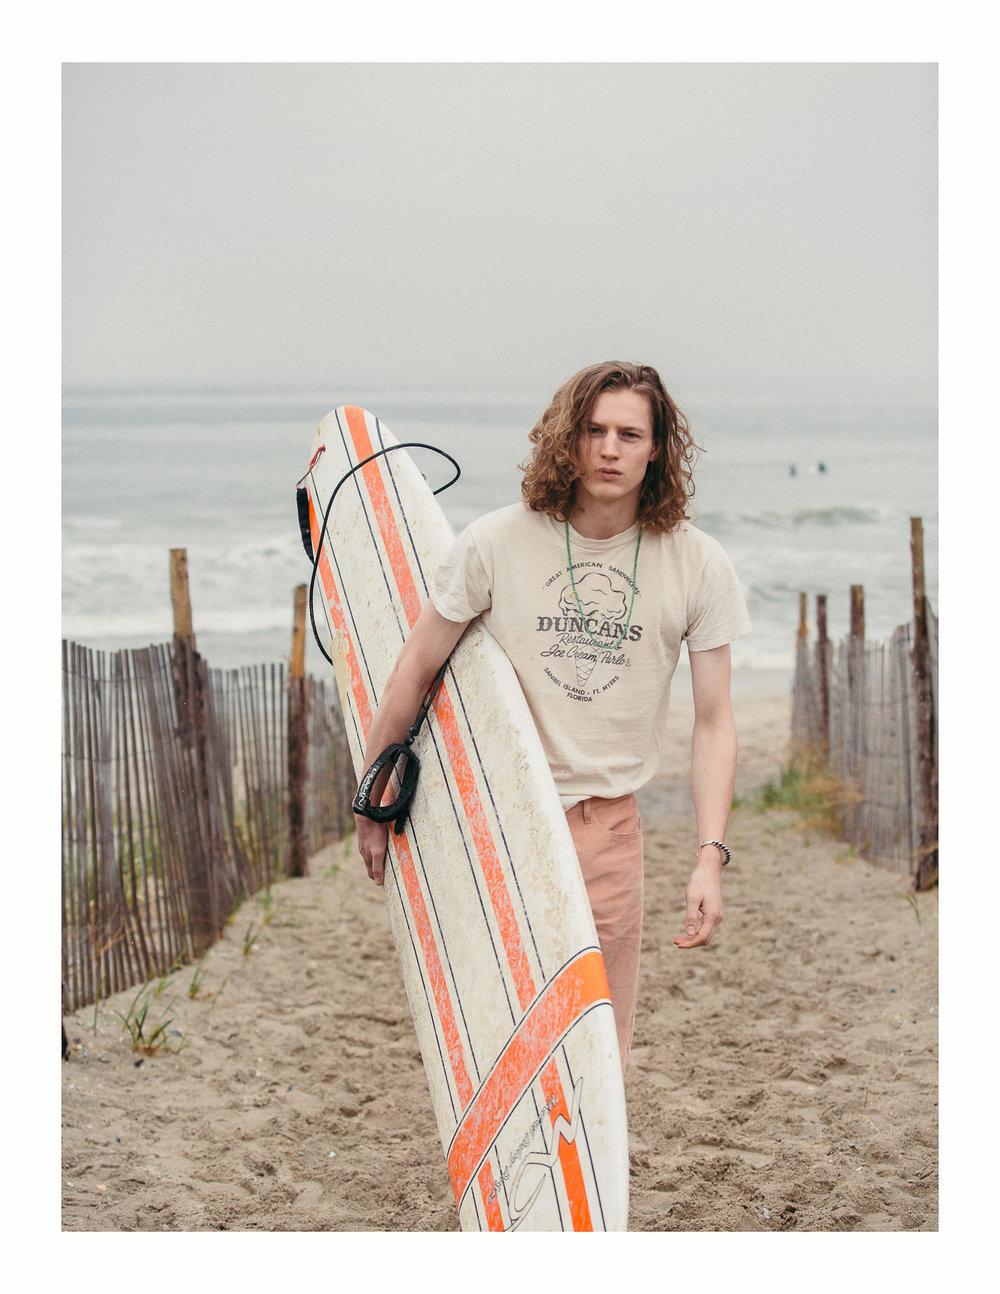 MM SURF-9.jpg